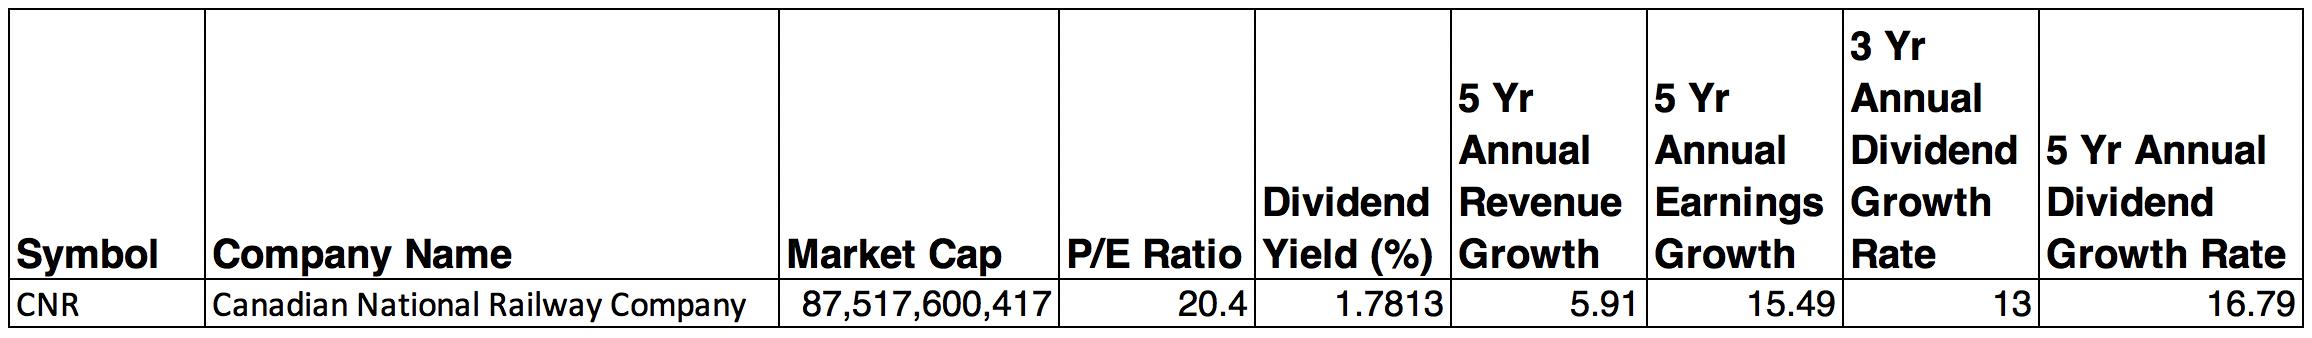 CN Rail Stock Dividend Growth